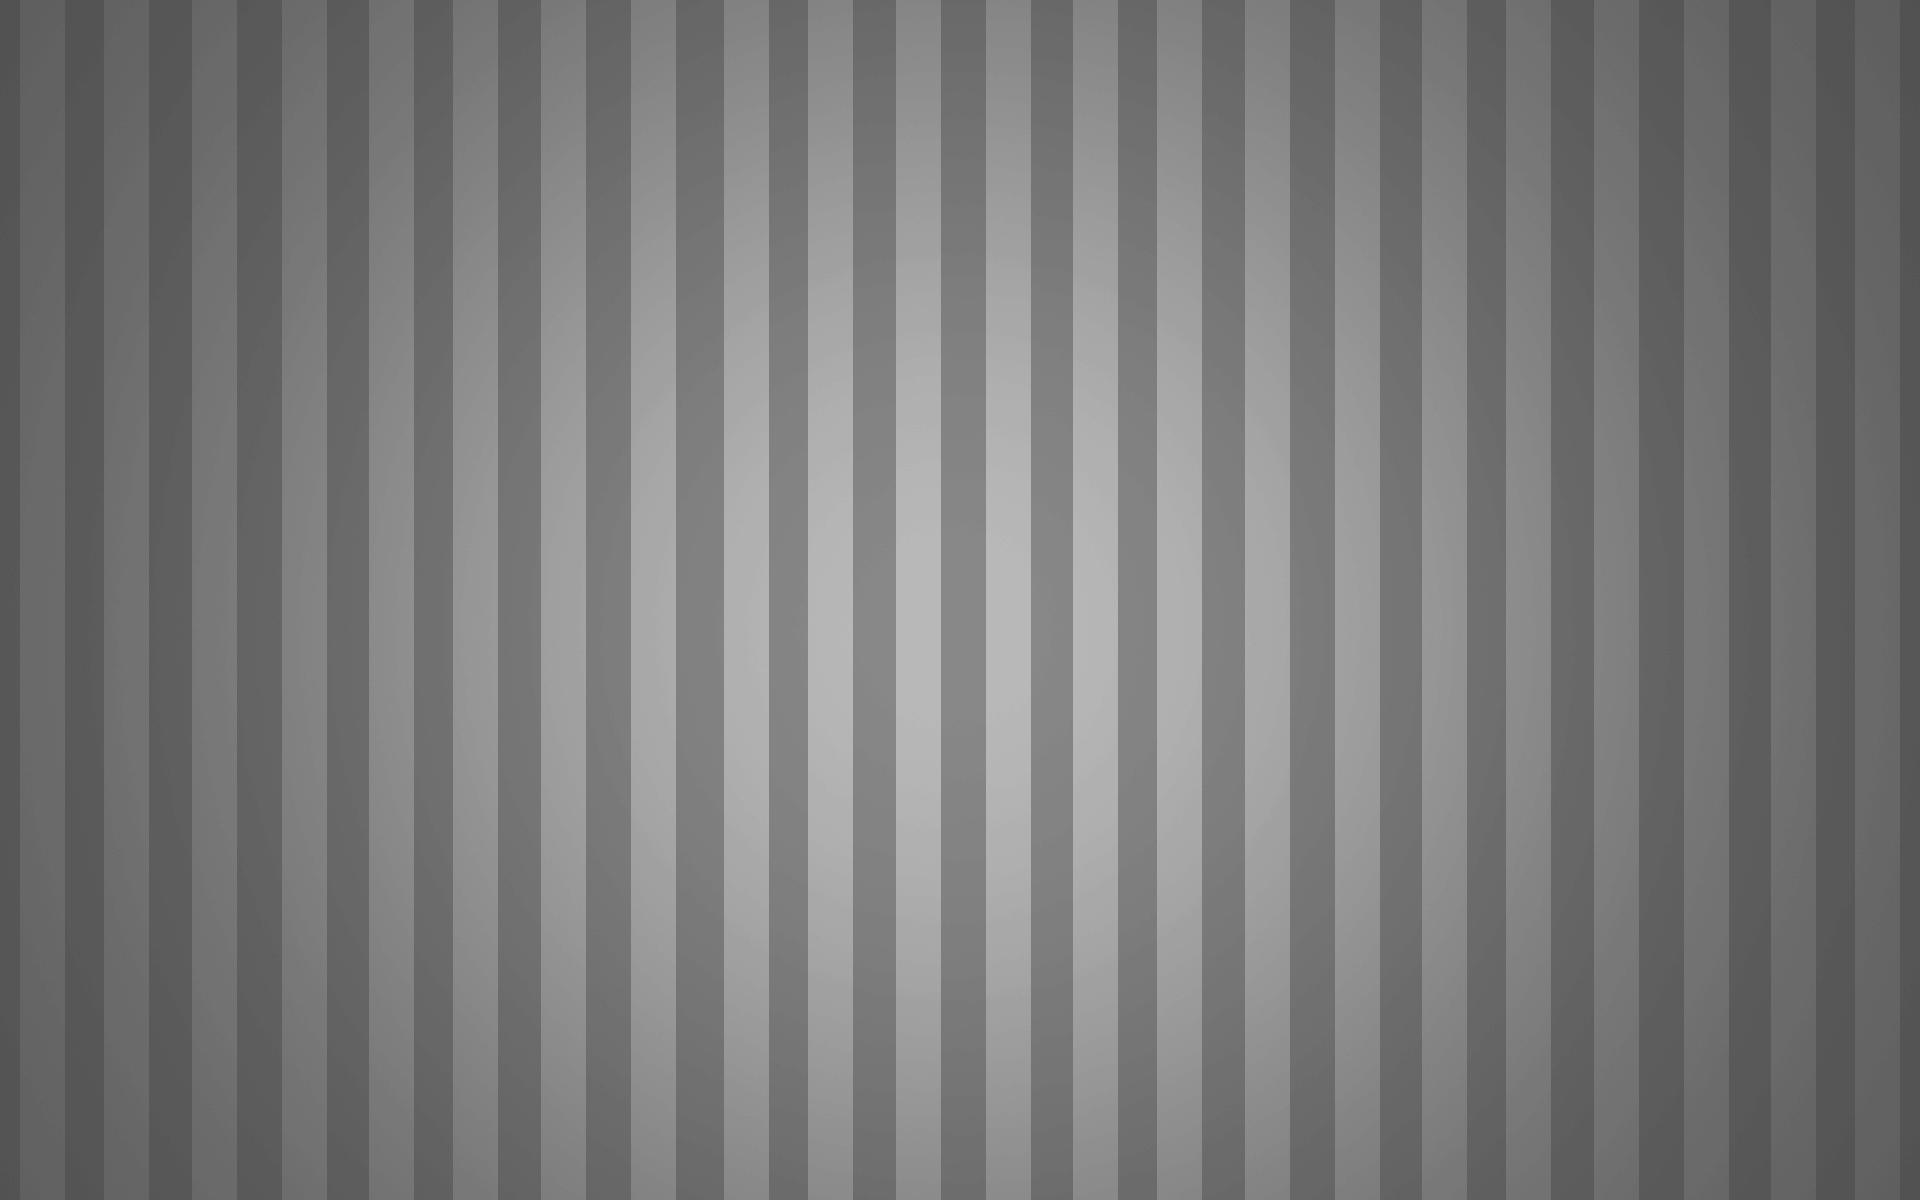 gray wallpapers wallpapersafari. Black Bedroom Furniture Sets. Home Design Ideas